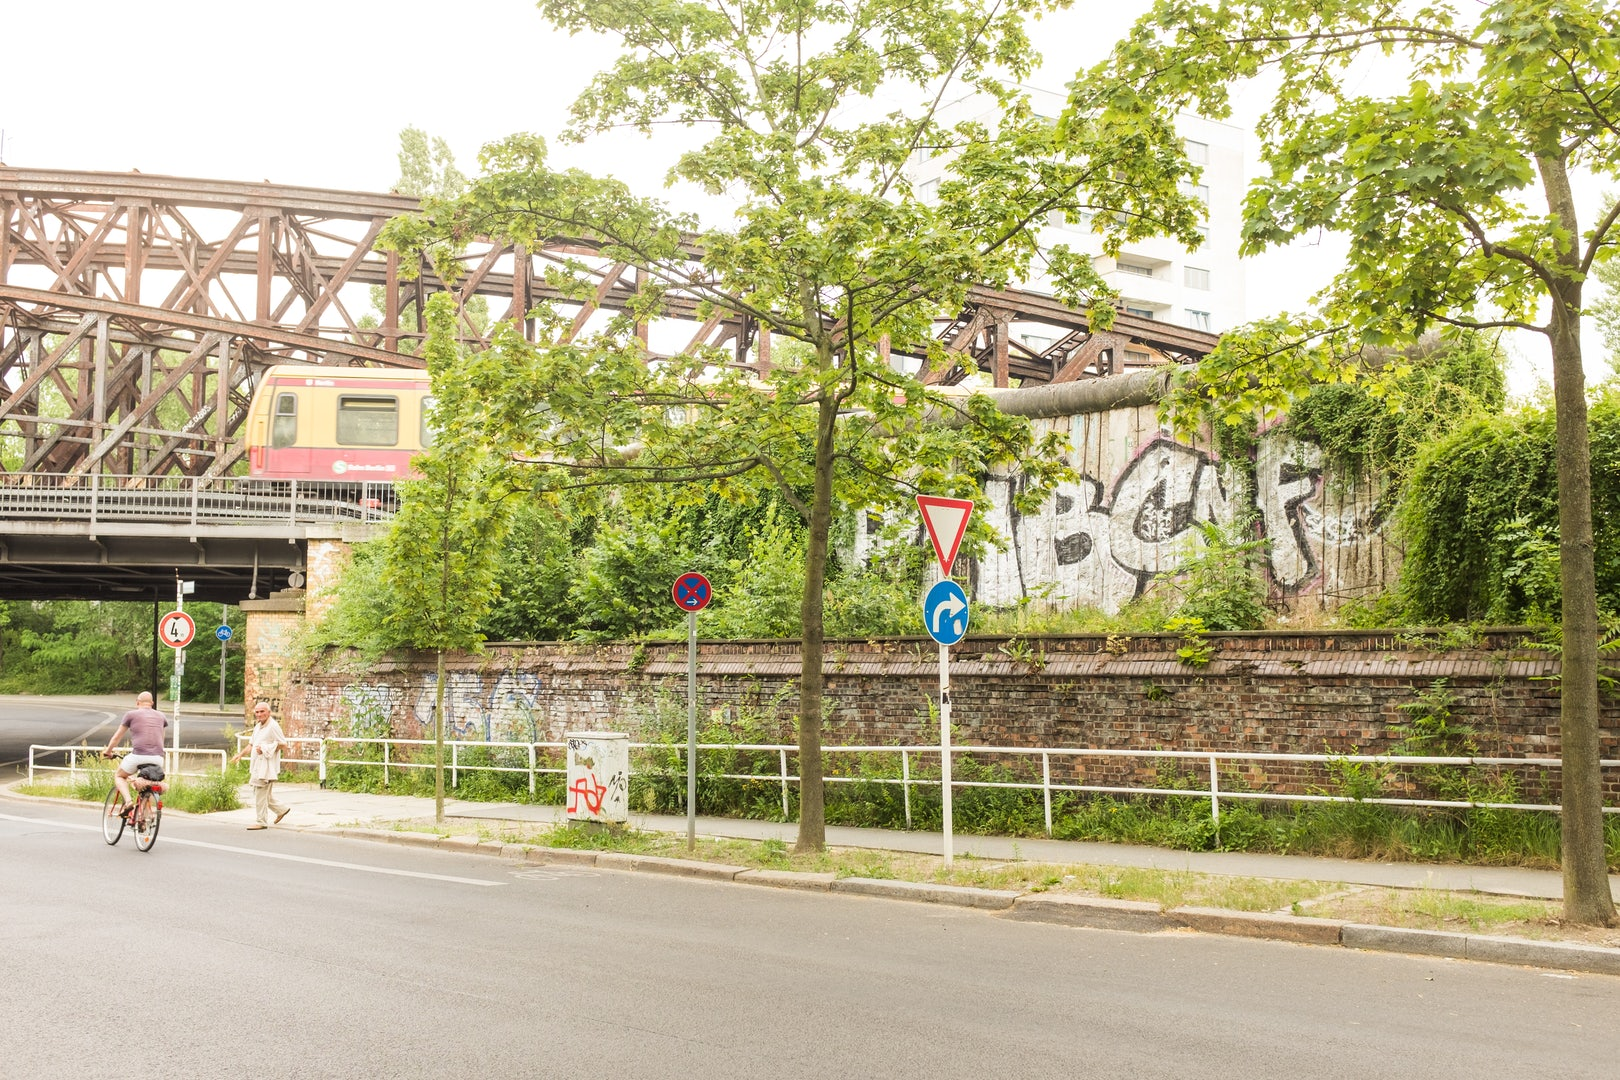 Berlin - Liesenstrasse